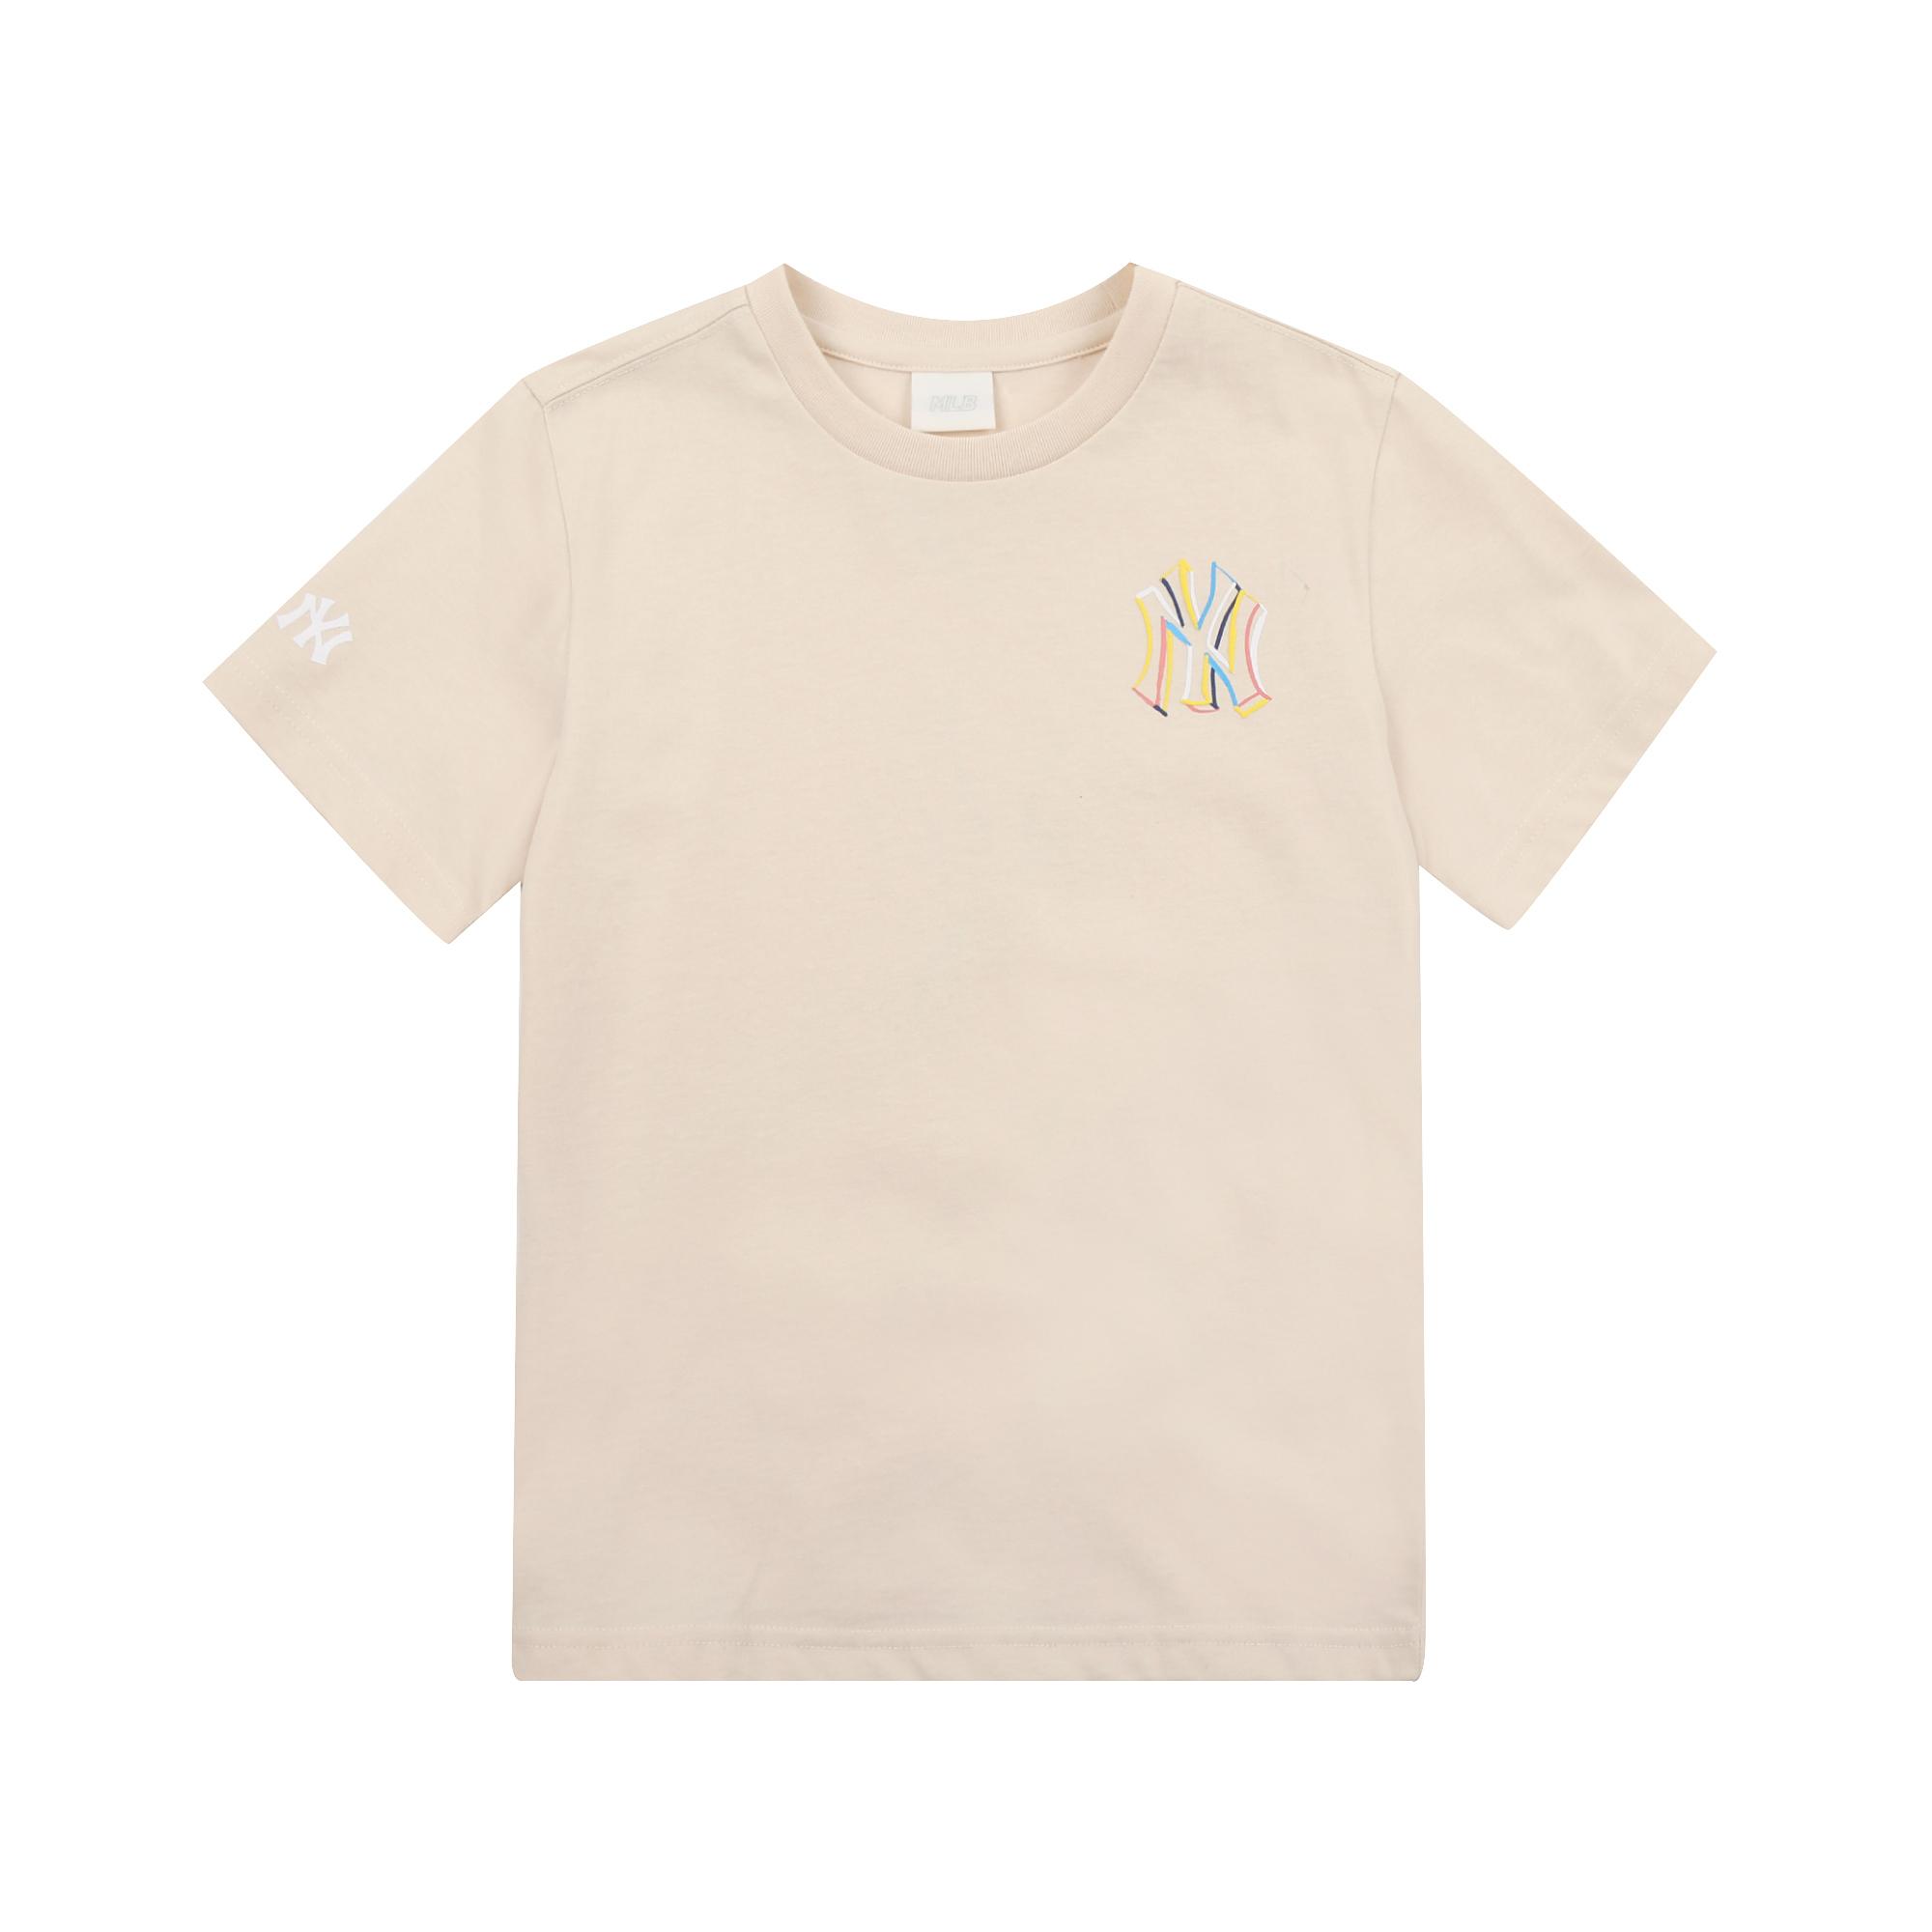 SEAM BALL 멀티 크레용 티셔츠 뉴욕양키스